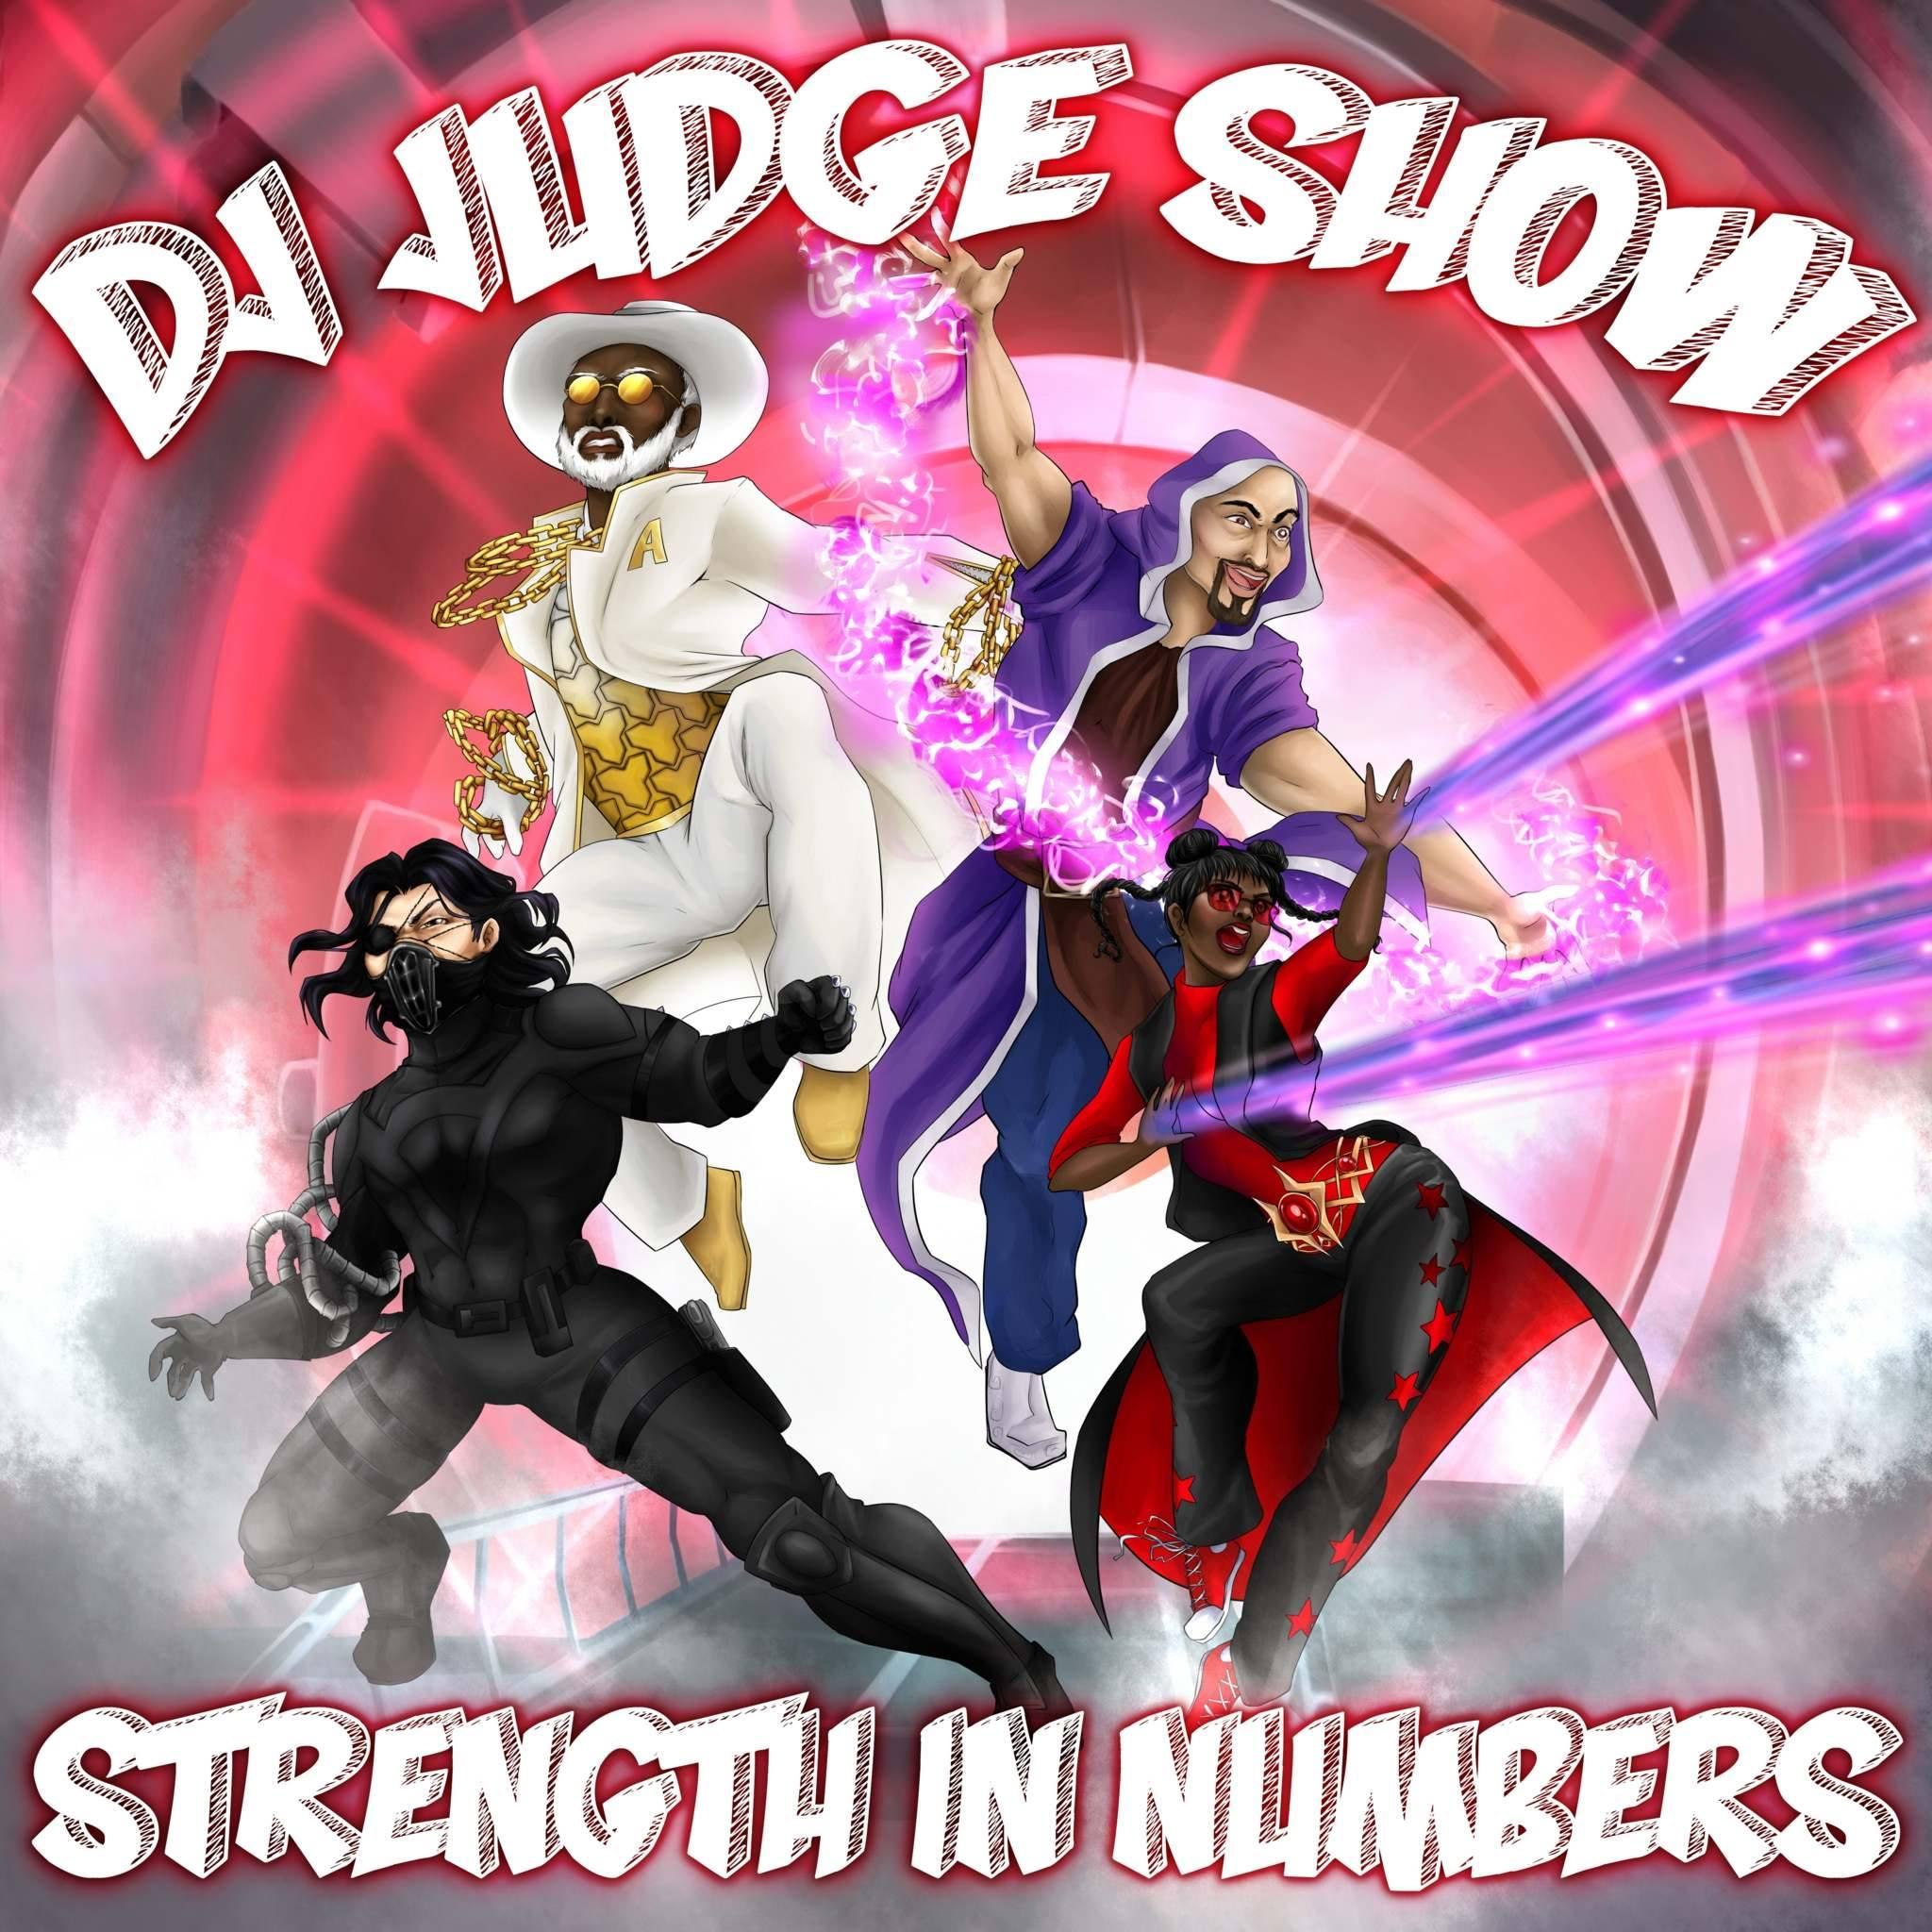 DJ Judge Show- Strength In Numbers.jpg